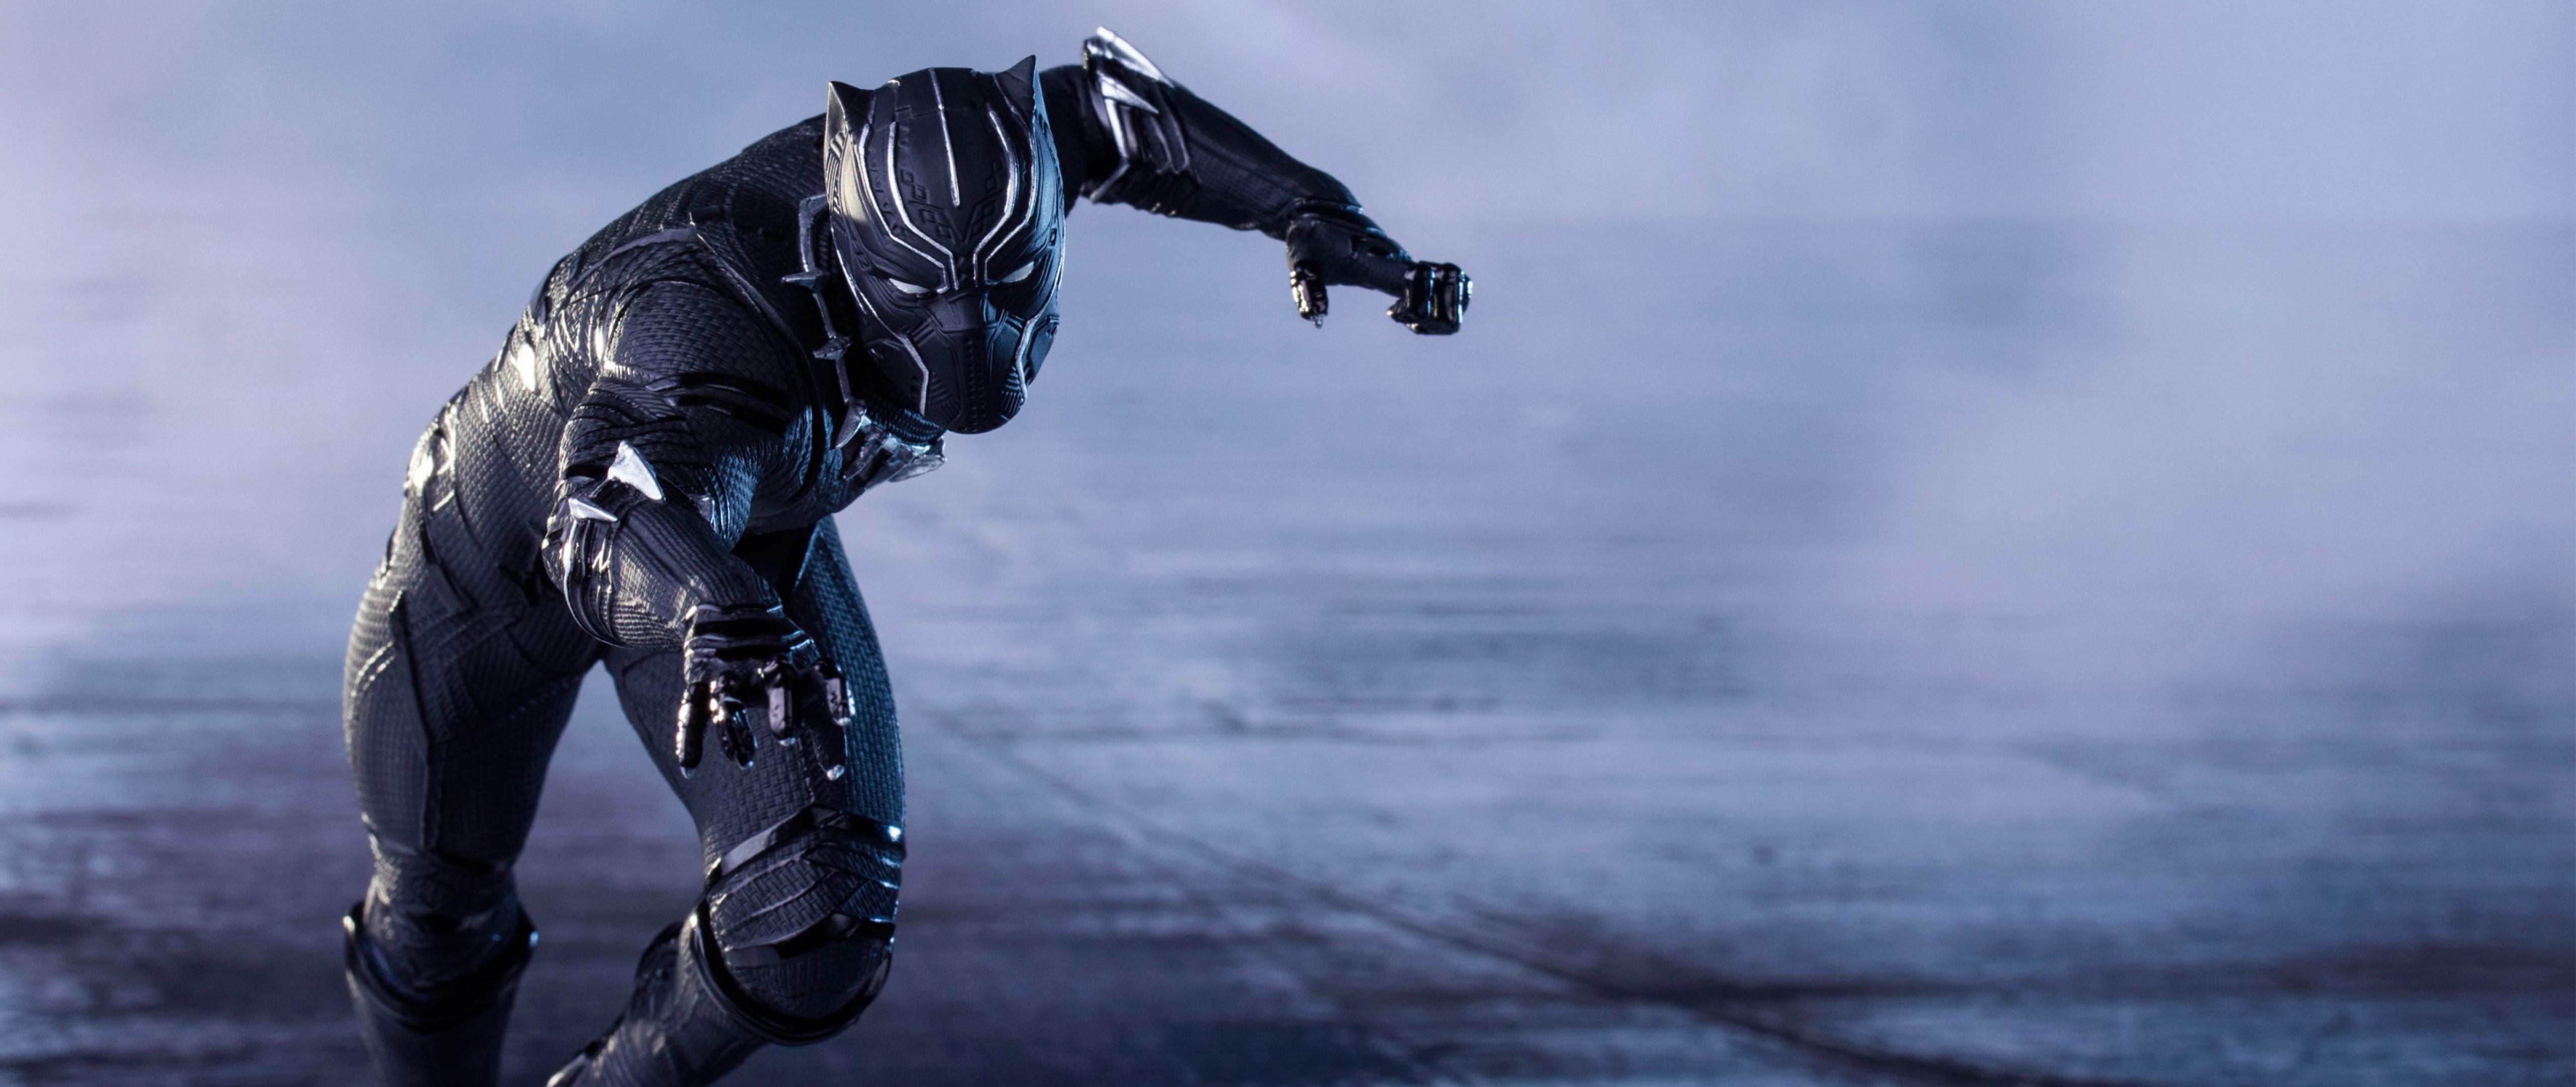 Captain America Civil War Black Panther Hd Wallpaper For